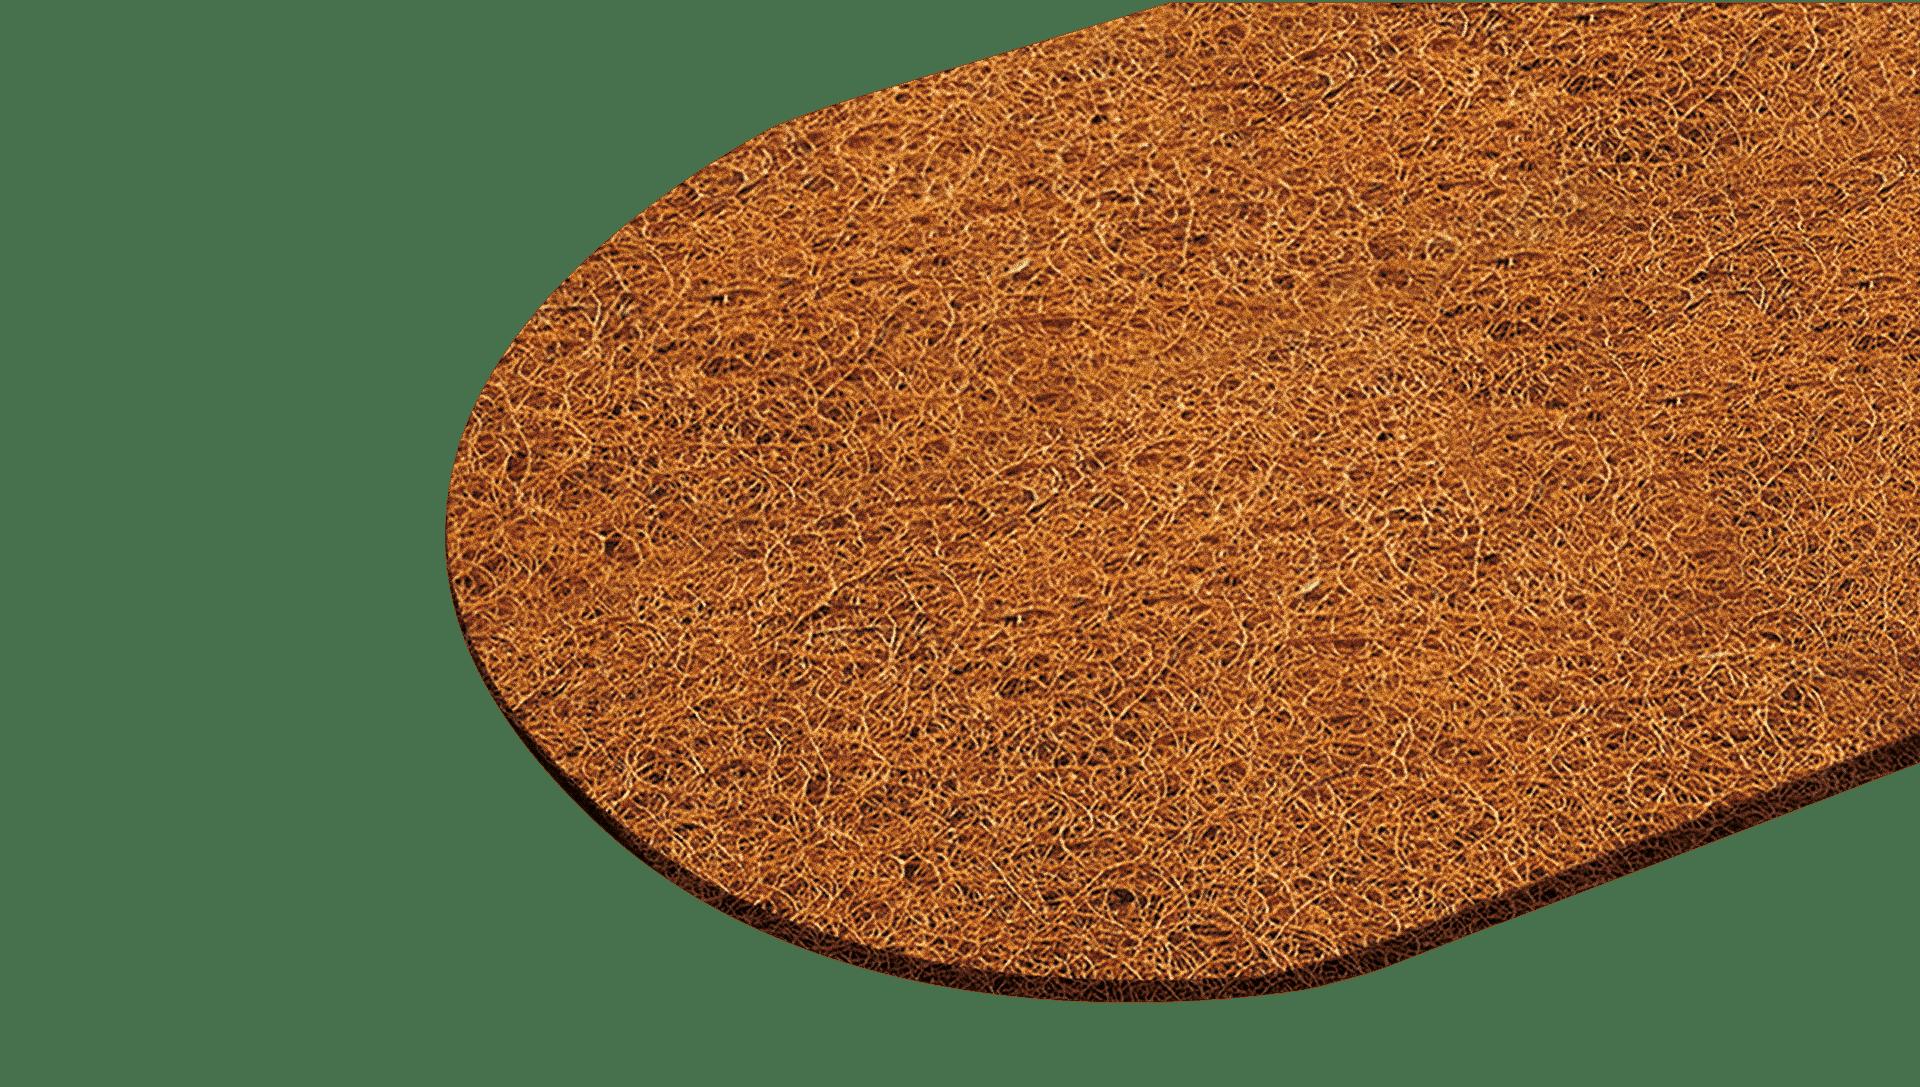 Grecostrom Στρώμα Καλαθούνας/Πορτ μπεμπε Ιόλη με ύφασμα Αντιβακτηριδιακό ελαστικό